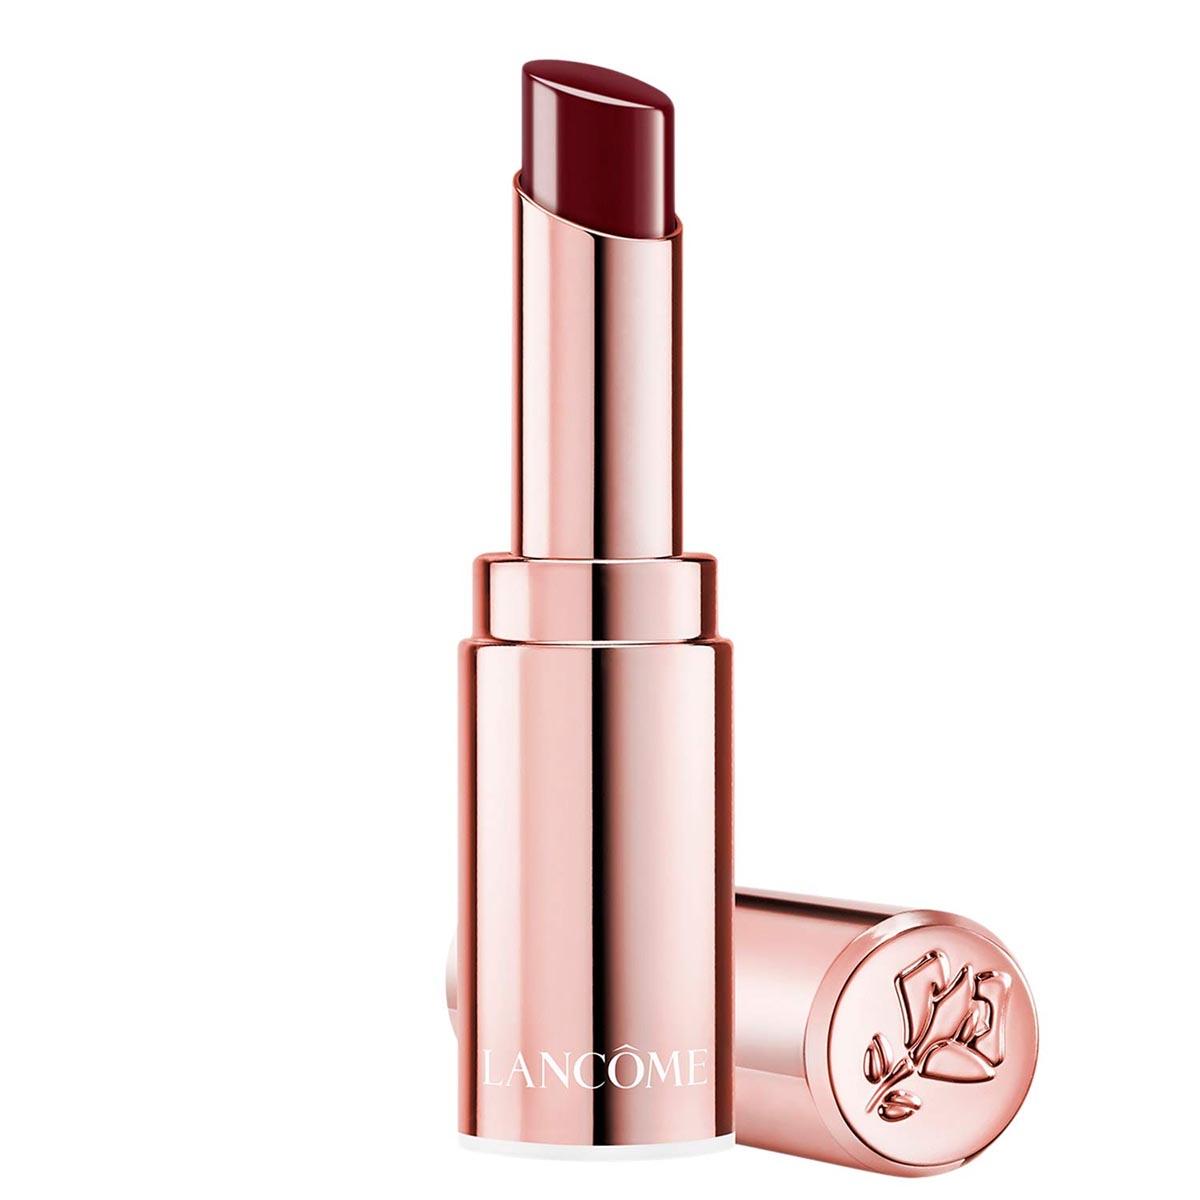 Lancome l absolu mademoiselle shine lipstick 397